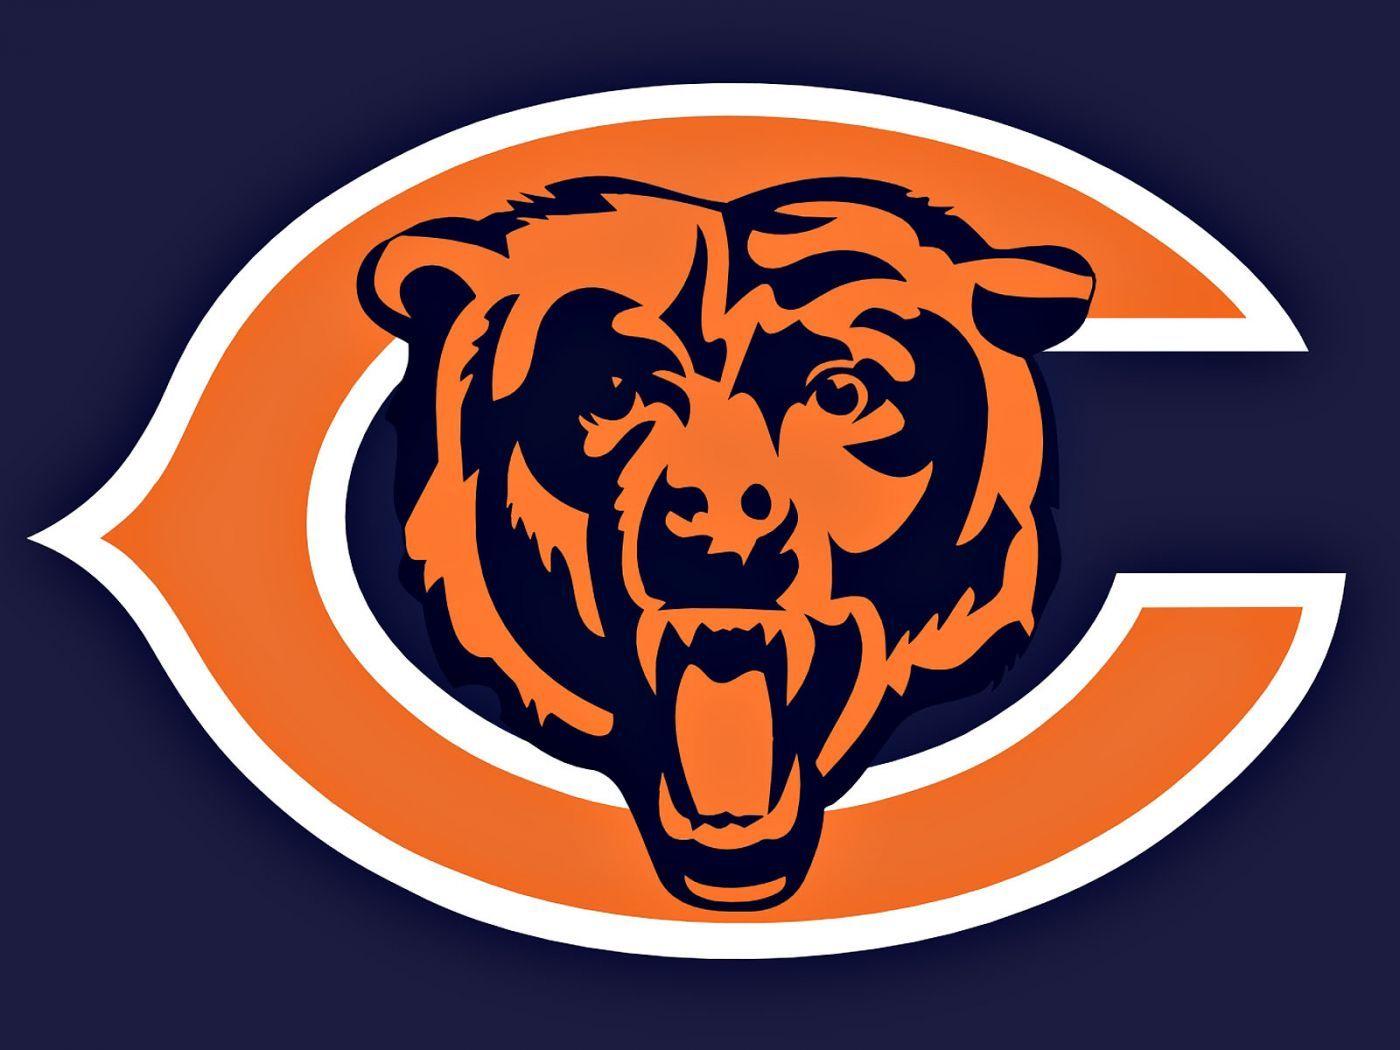 9 best sport team logos images on pinterest deporte sports and rh pinterest com chicago bears logo vector art chicago bears logo vector image